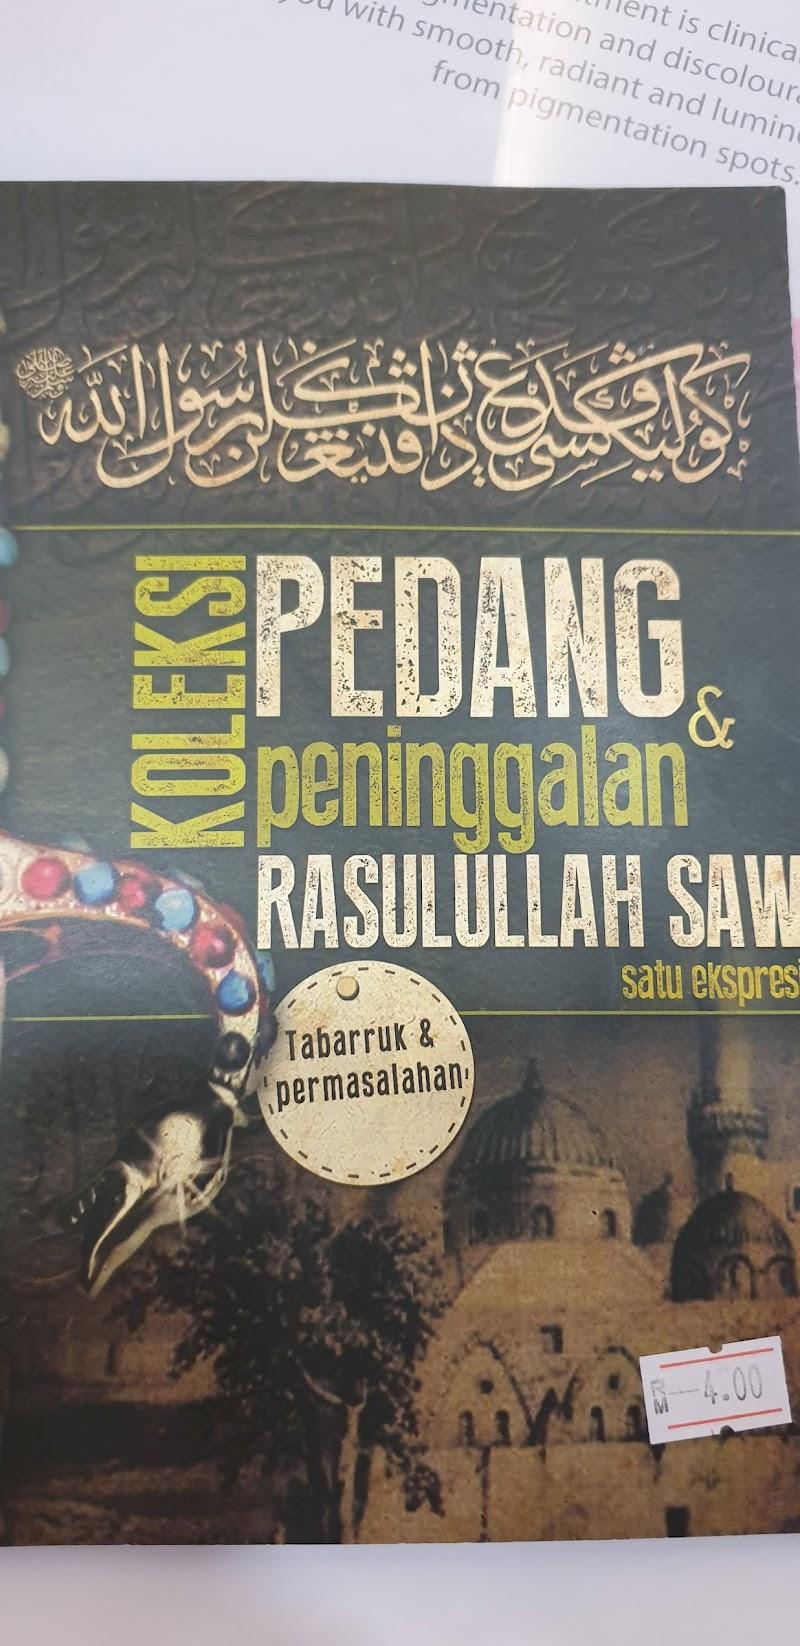 Koleksi Pedang dan Peninggalan Rasulullah SAW - Satu Ekspresi Susunan Ustaz Muhammad Fadli bin Ismail